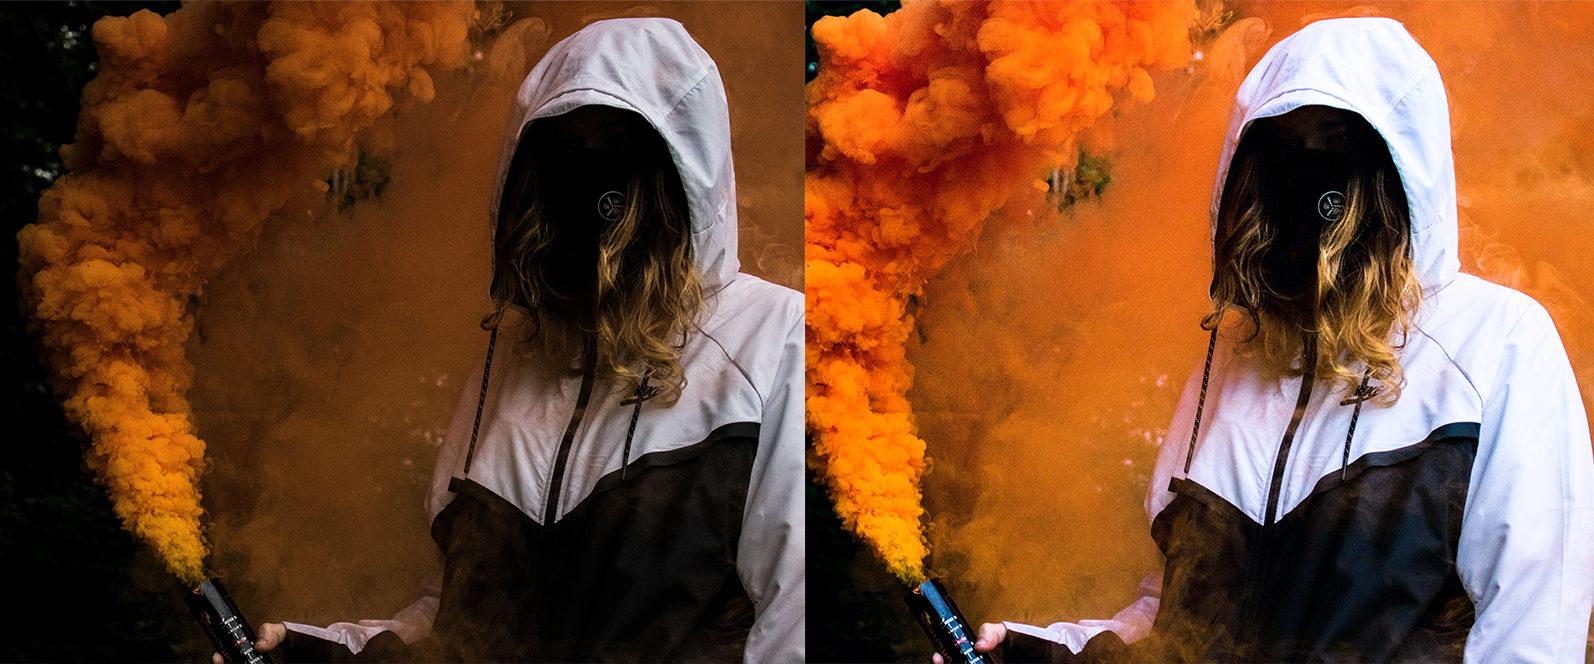 12 Smoke Bomb Lightroom Presets to enhance your Smoke Bomb Photoshoots - Preview 8 6 -